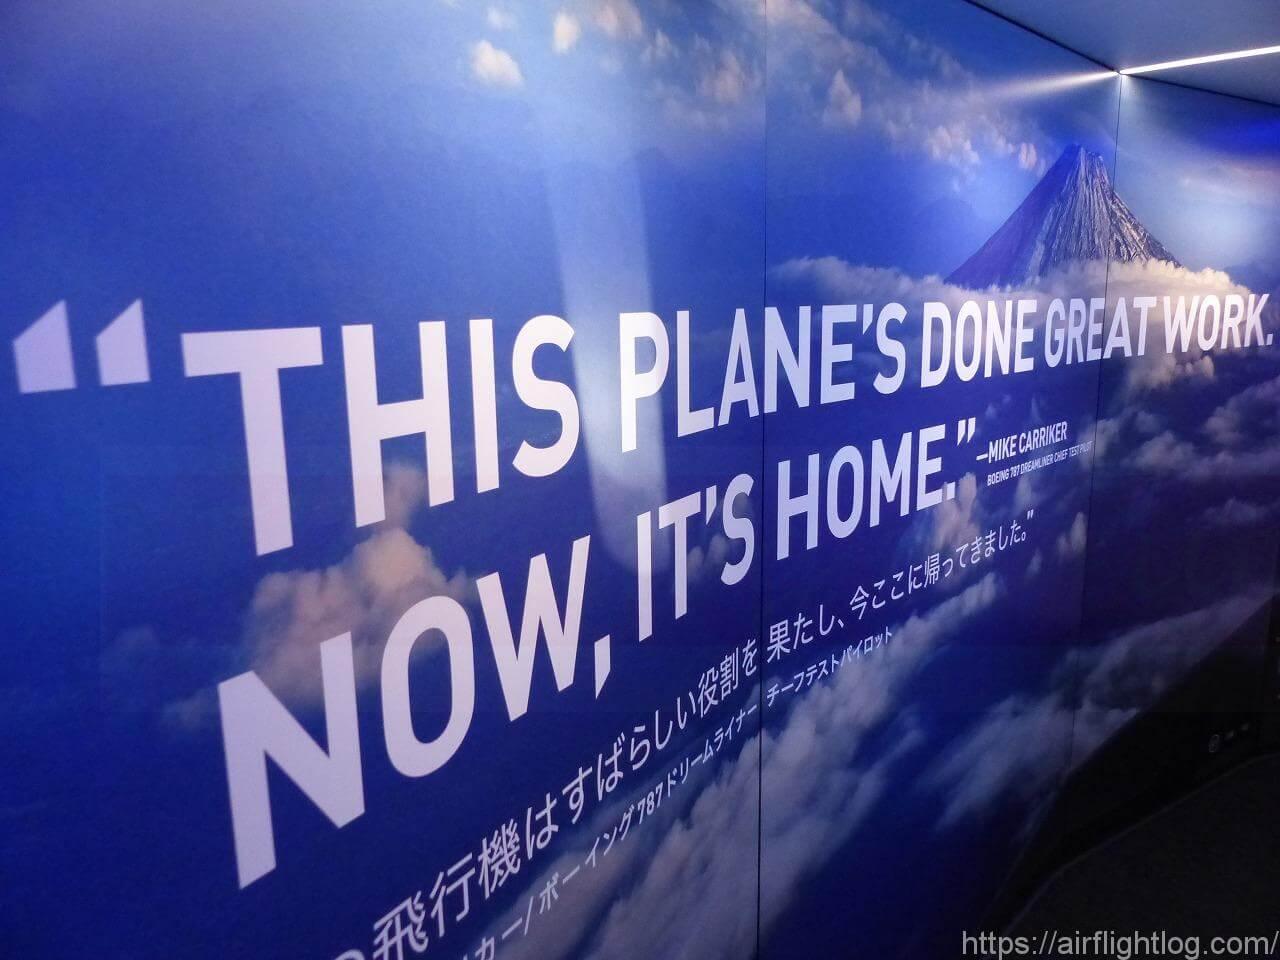 「FLIGHT OF DREAMS(フライト・オブ・ドリームズ)」ボーイング787初号機内部背面